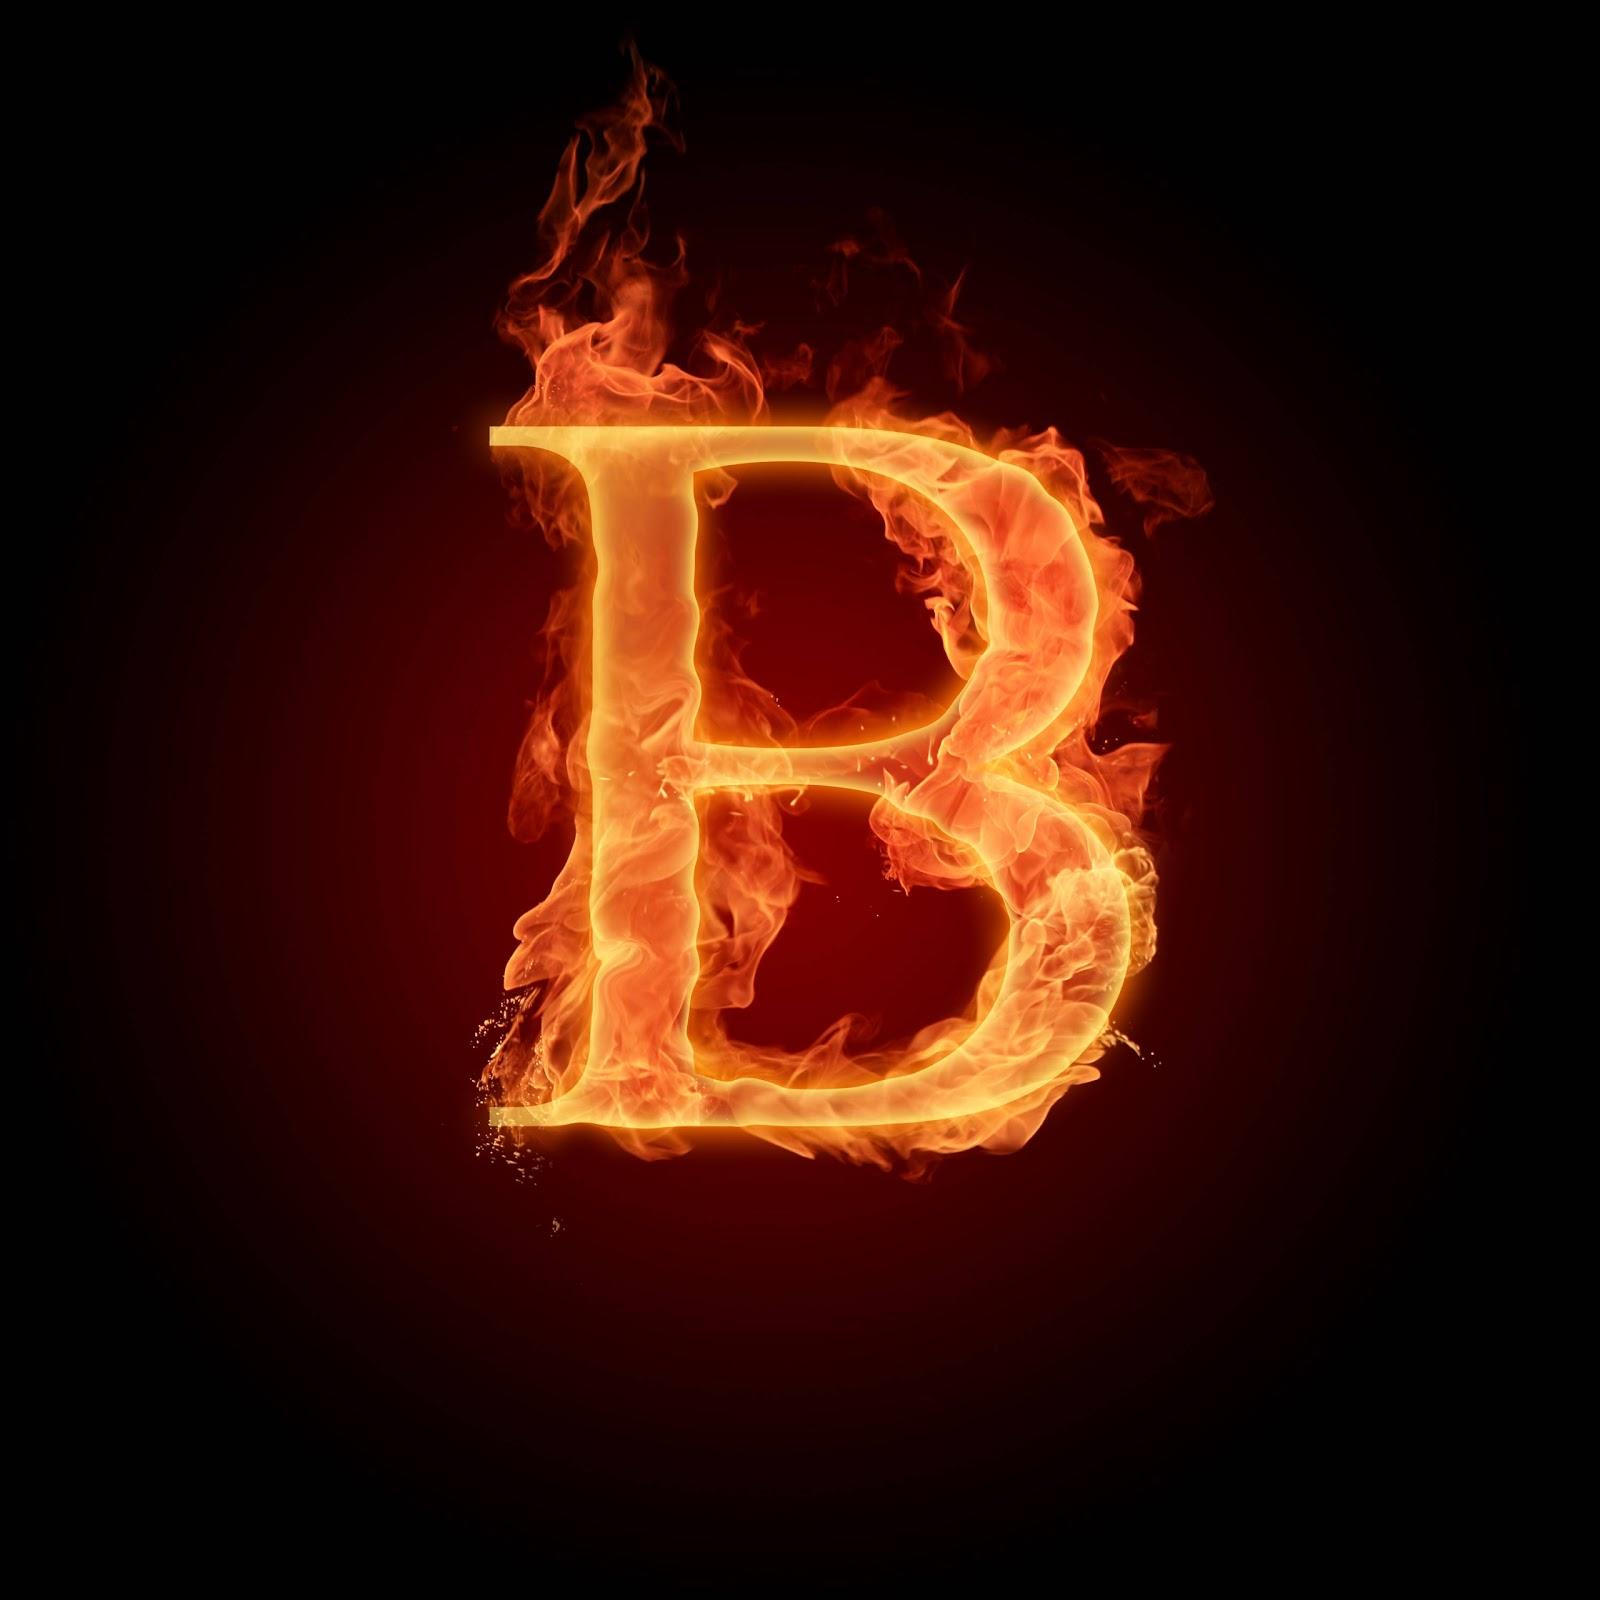 alphabet u freshmaza com sep may gold letter ghost alphabet